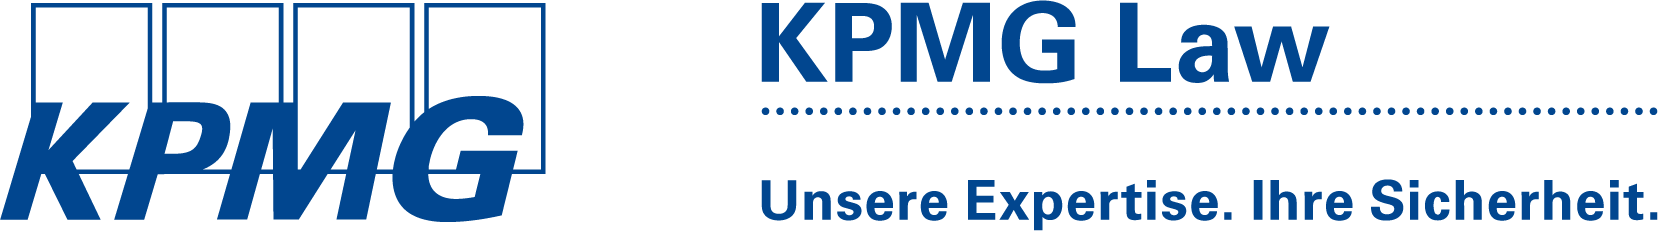 KPMG Law Rechtsanwaltsgesellschaft mbH